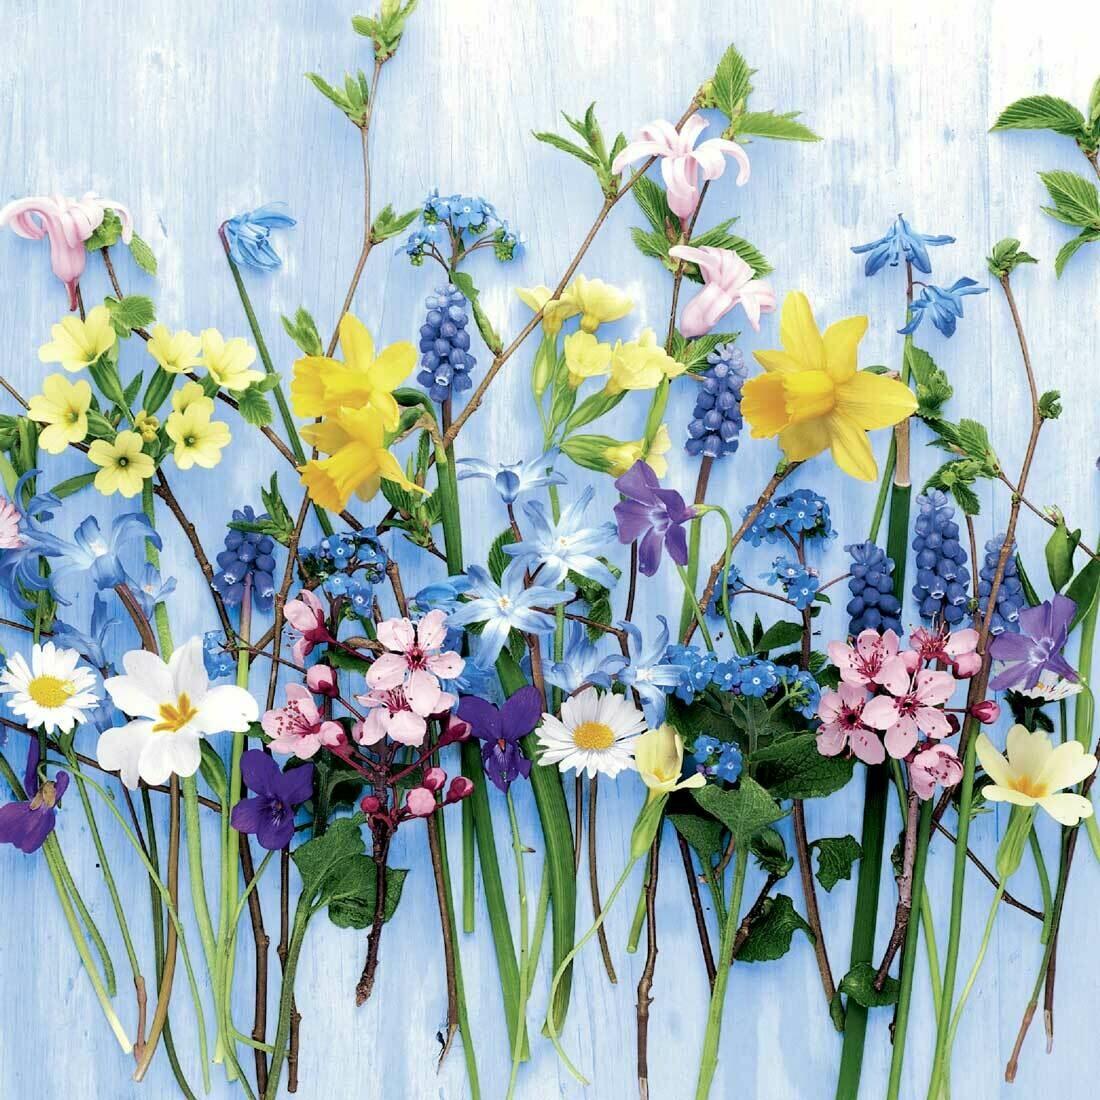 Decoupage Paper Napkins - Floral - Spring Flowers (1 Sheet)